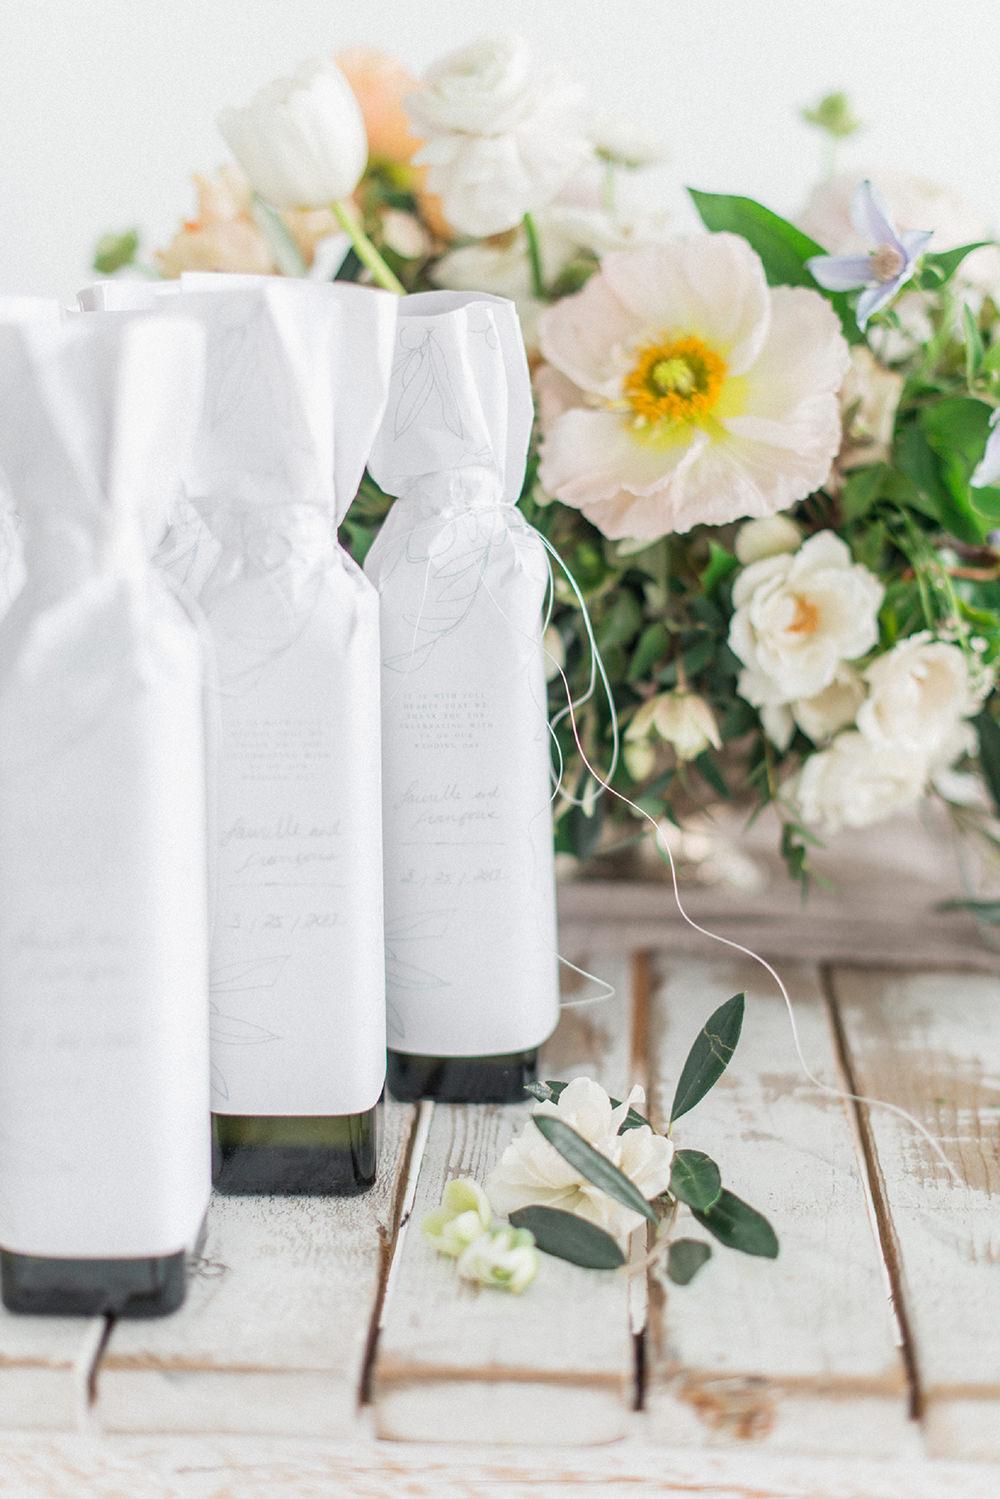 printable wedding favors - photo by Laura Kelly Photography https://ruffledblog.com/minimalist-monochrome-european-wedding-inspiration